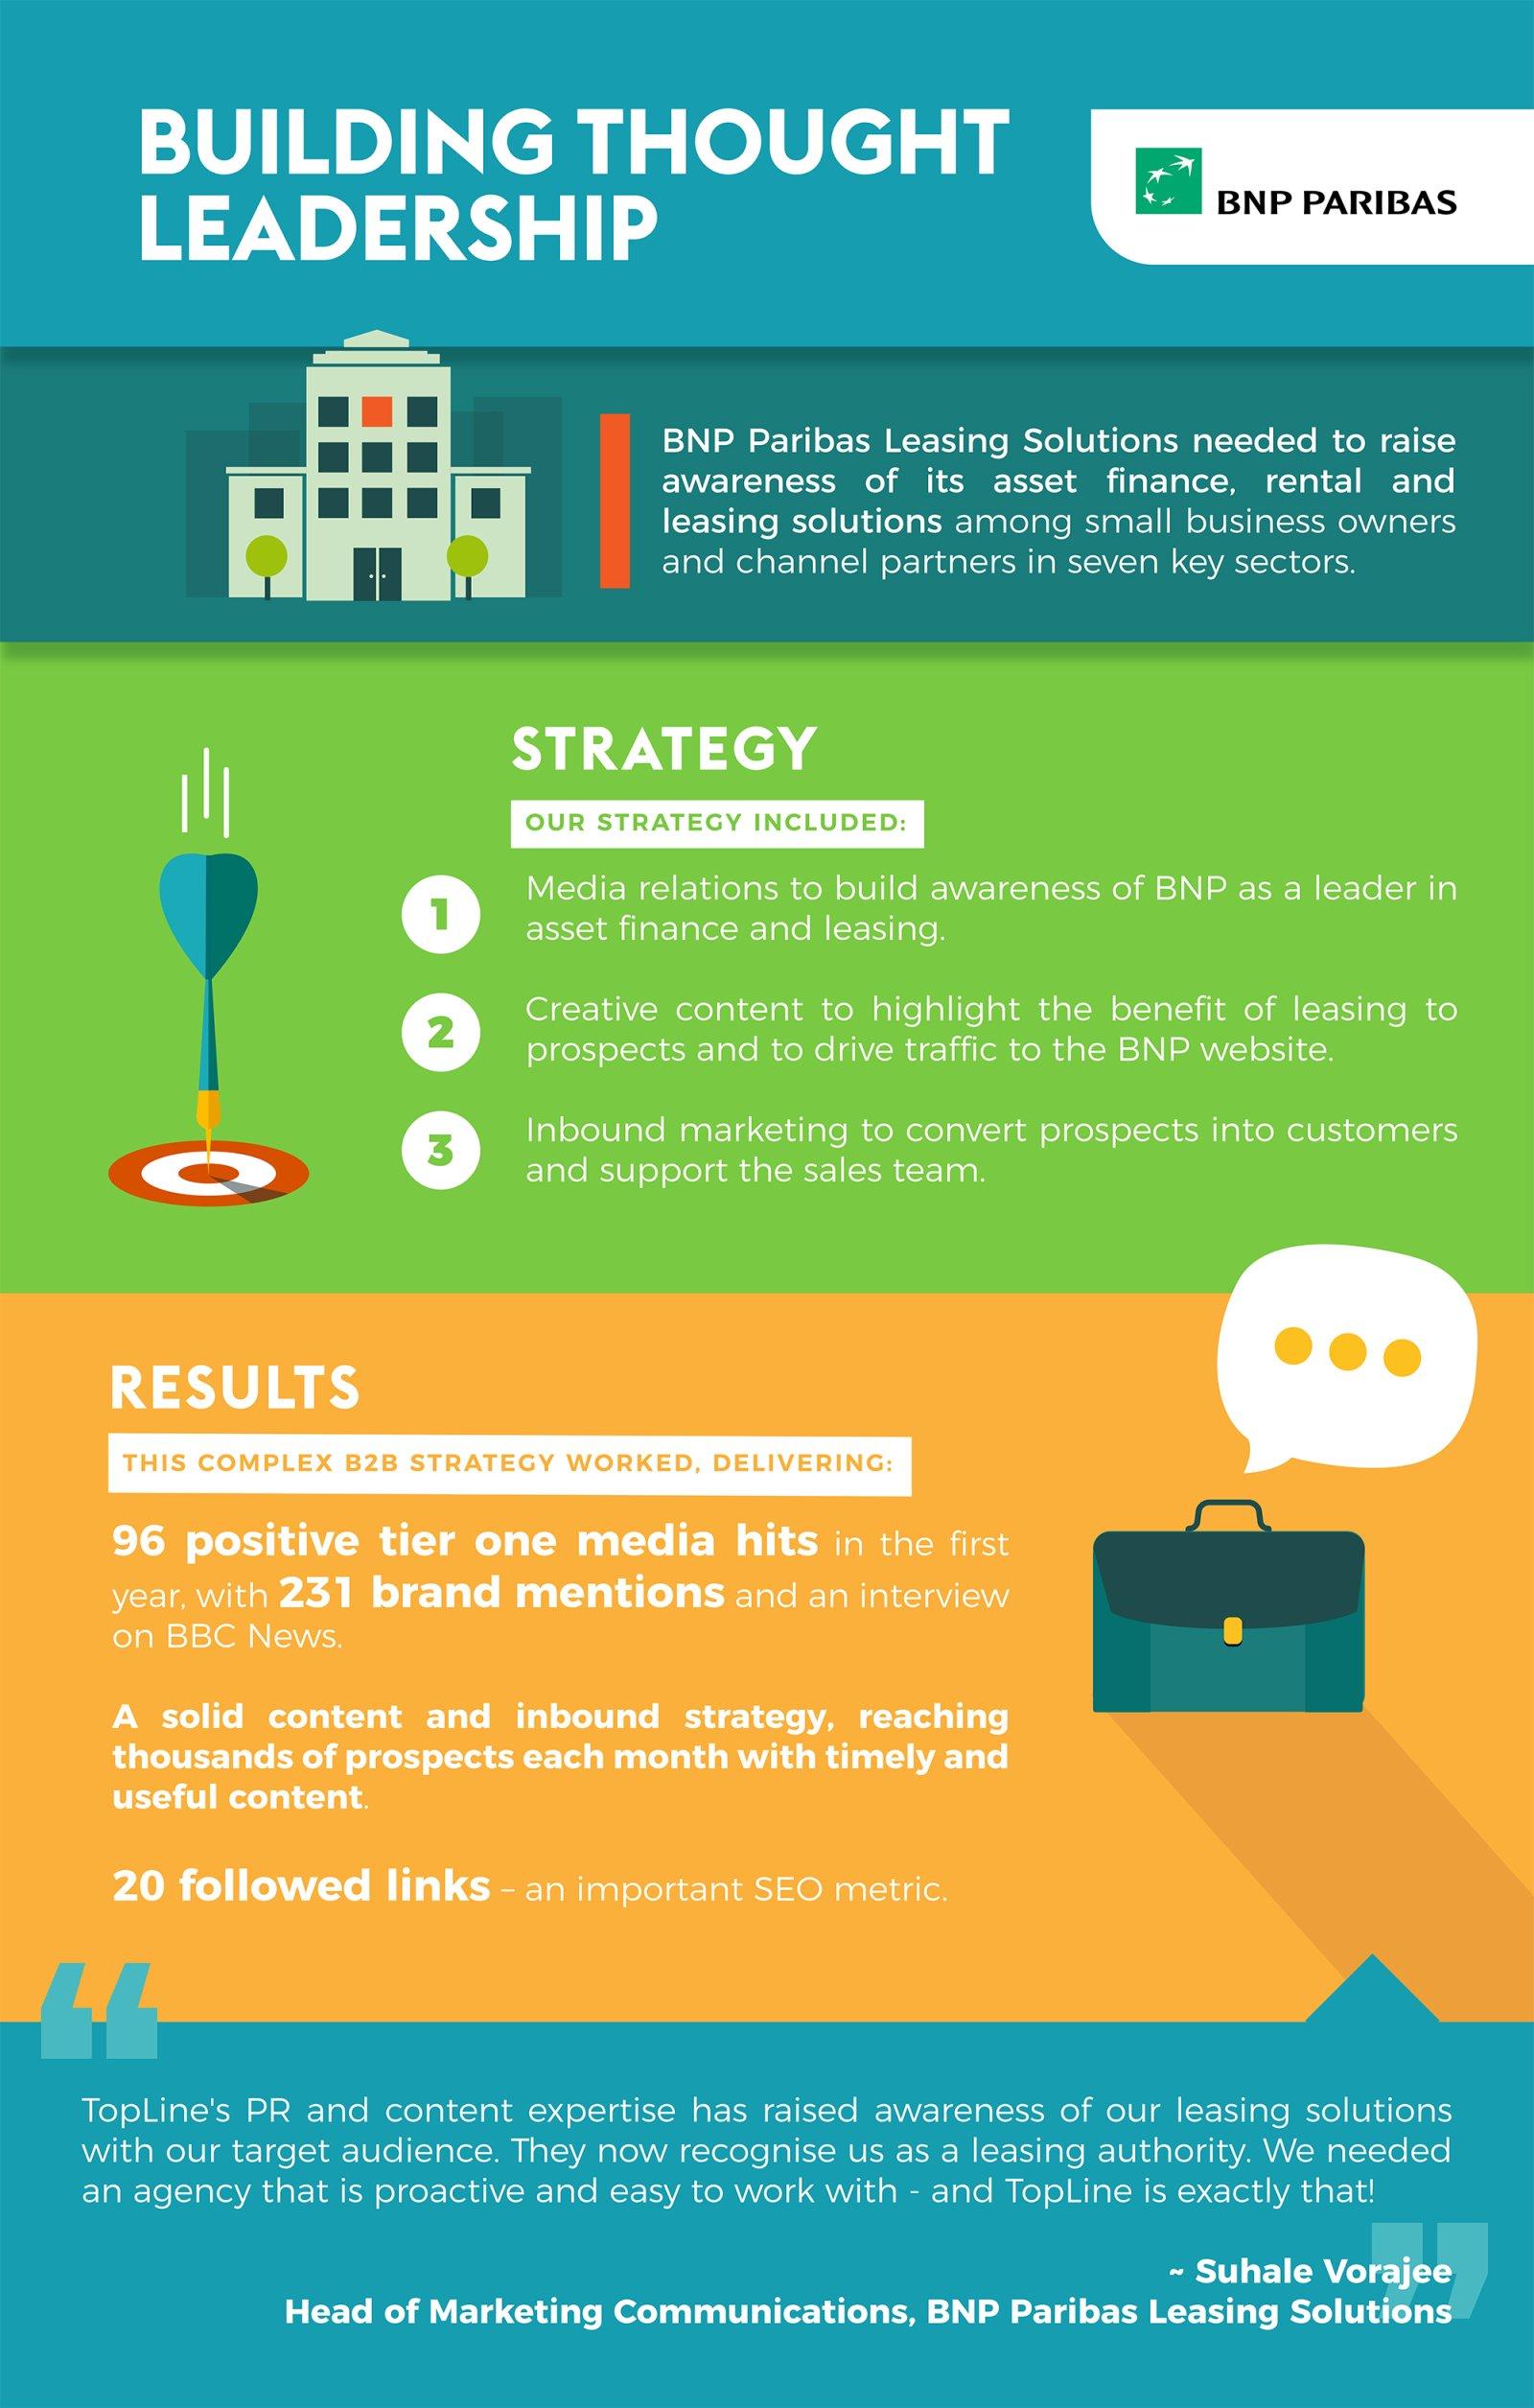 BNP Paribas Case Study Infographic